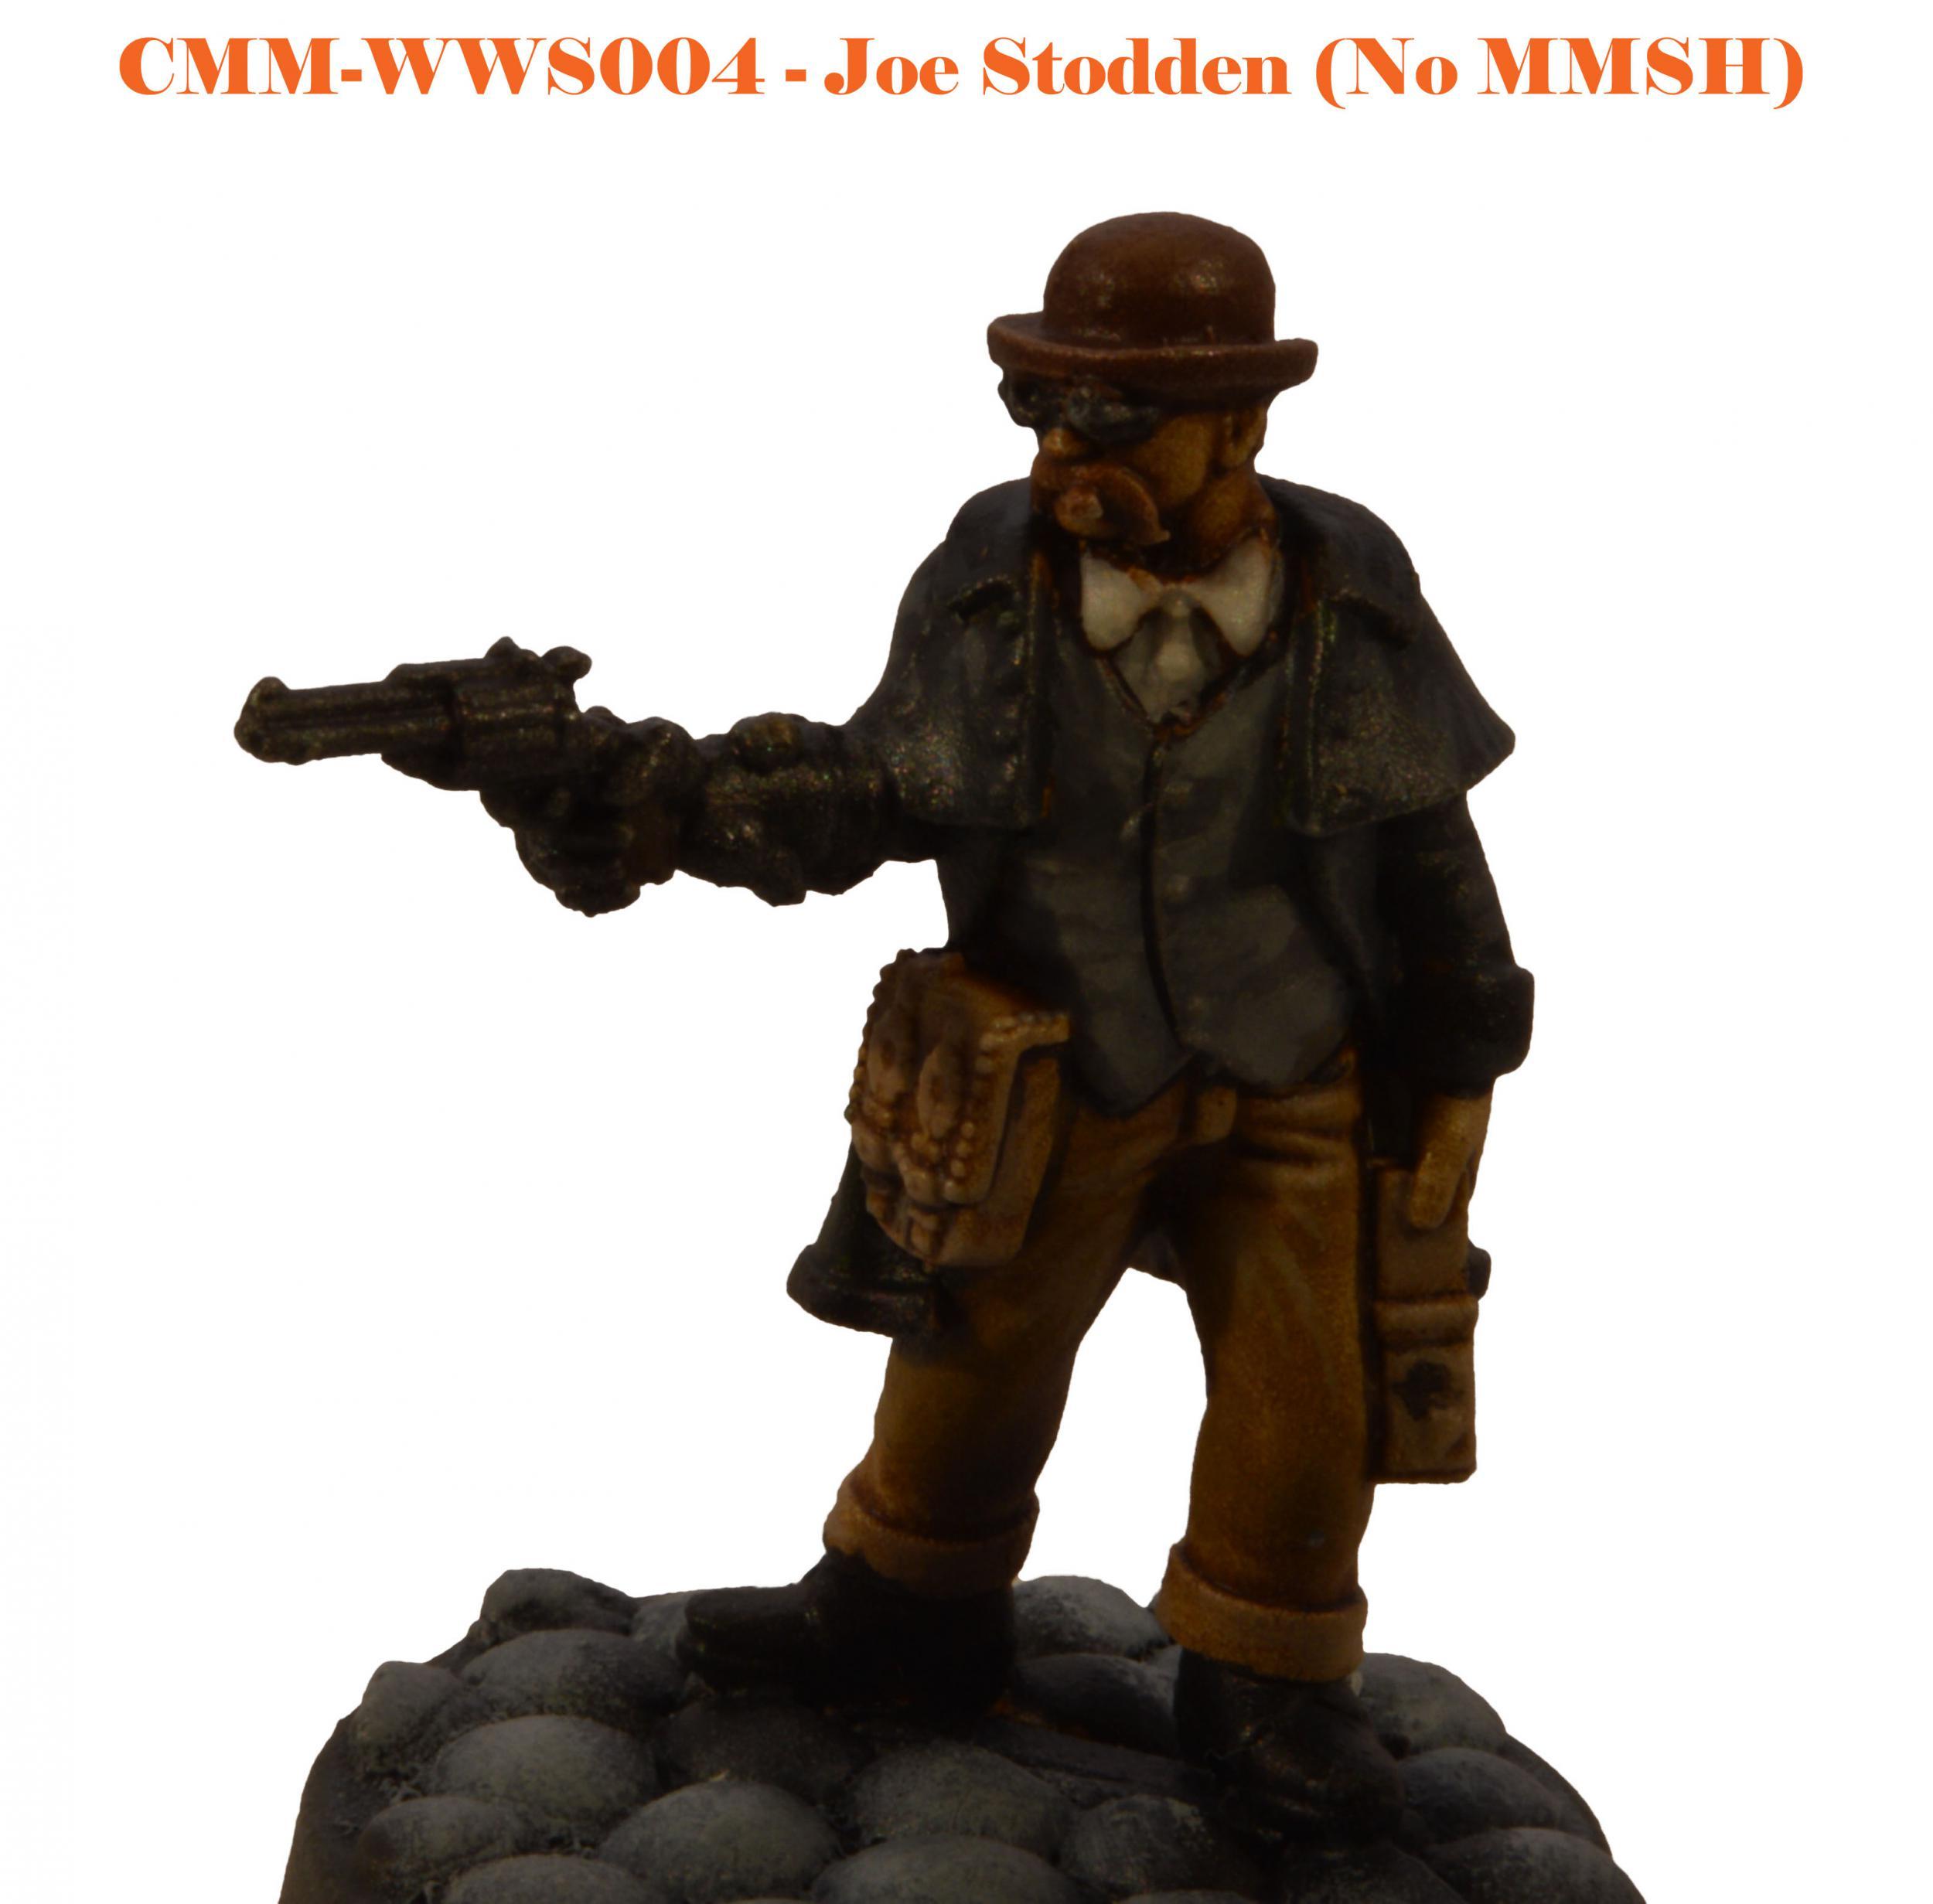 WSS004 - Joe Stodden (dismounted)